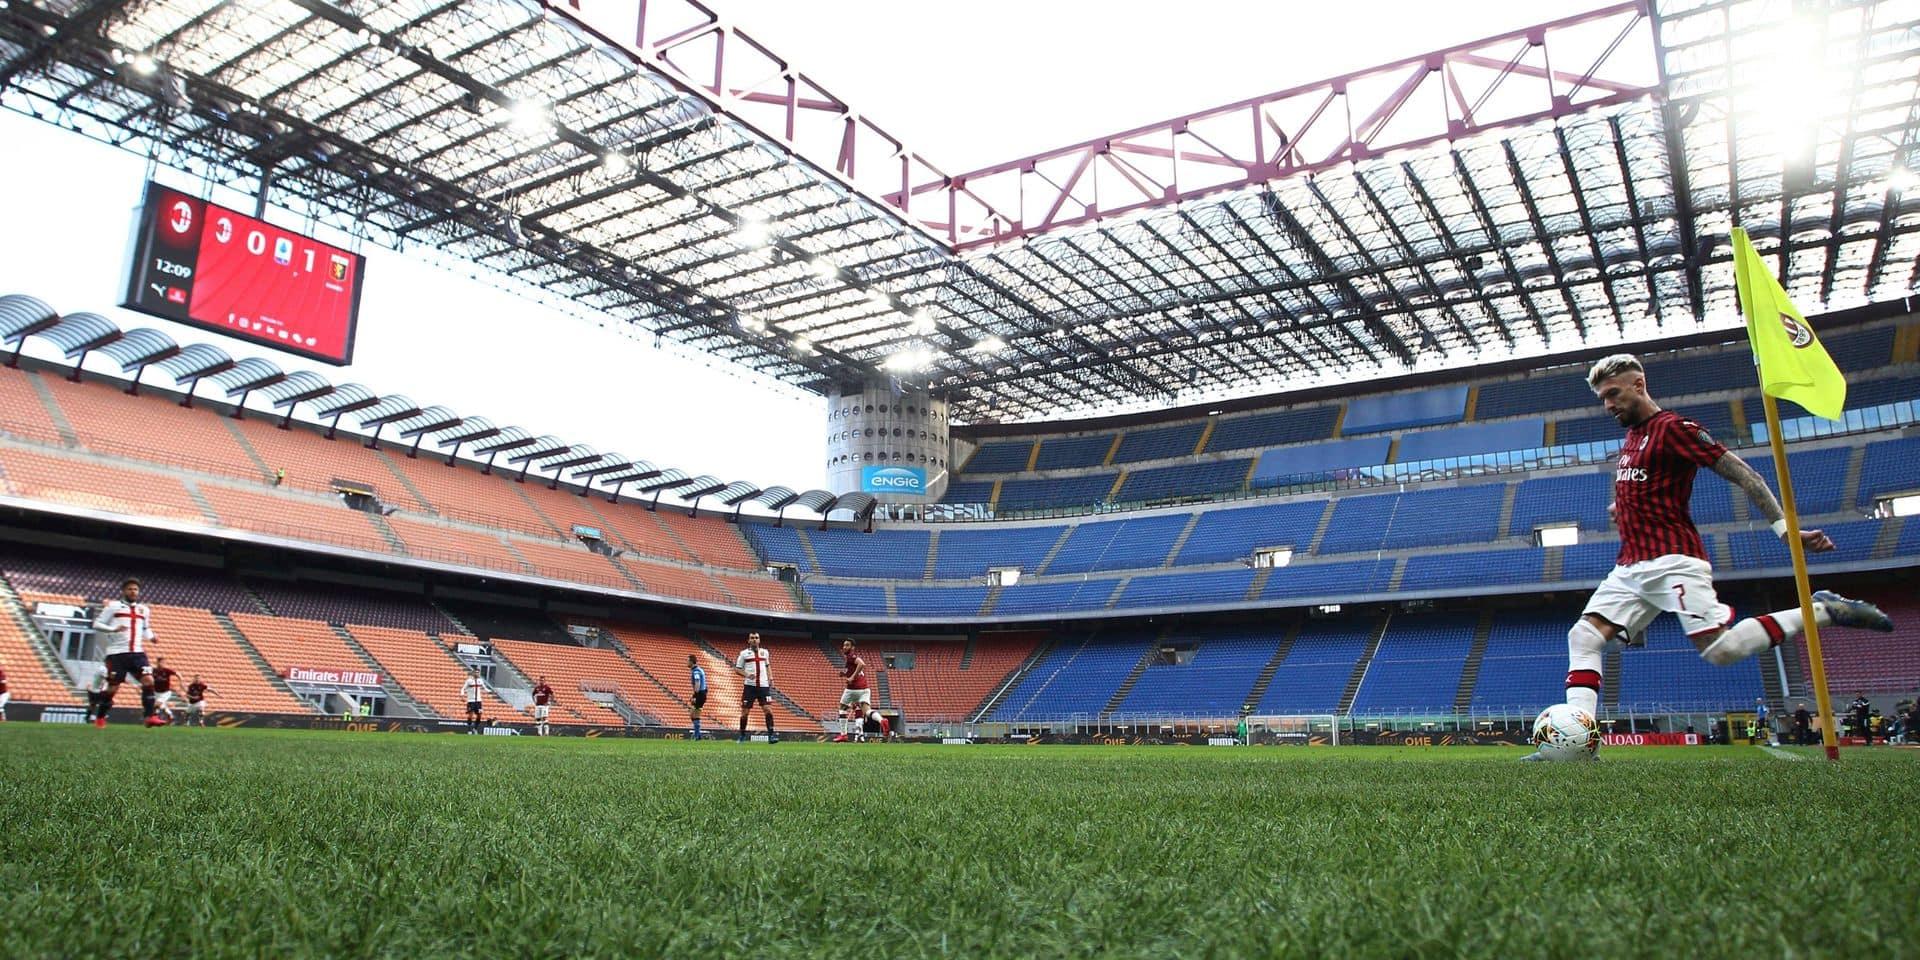 les matches maintenus malgré le coronavirus, Milan battu